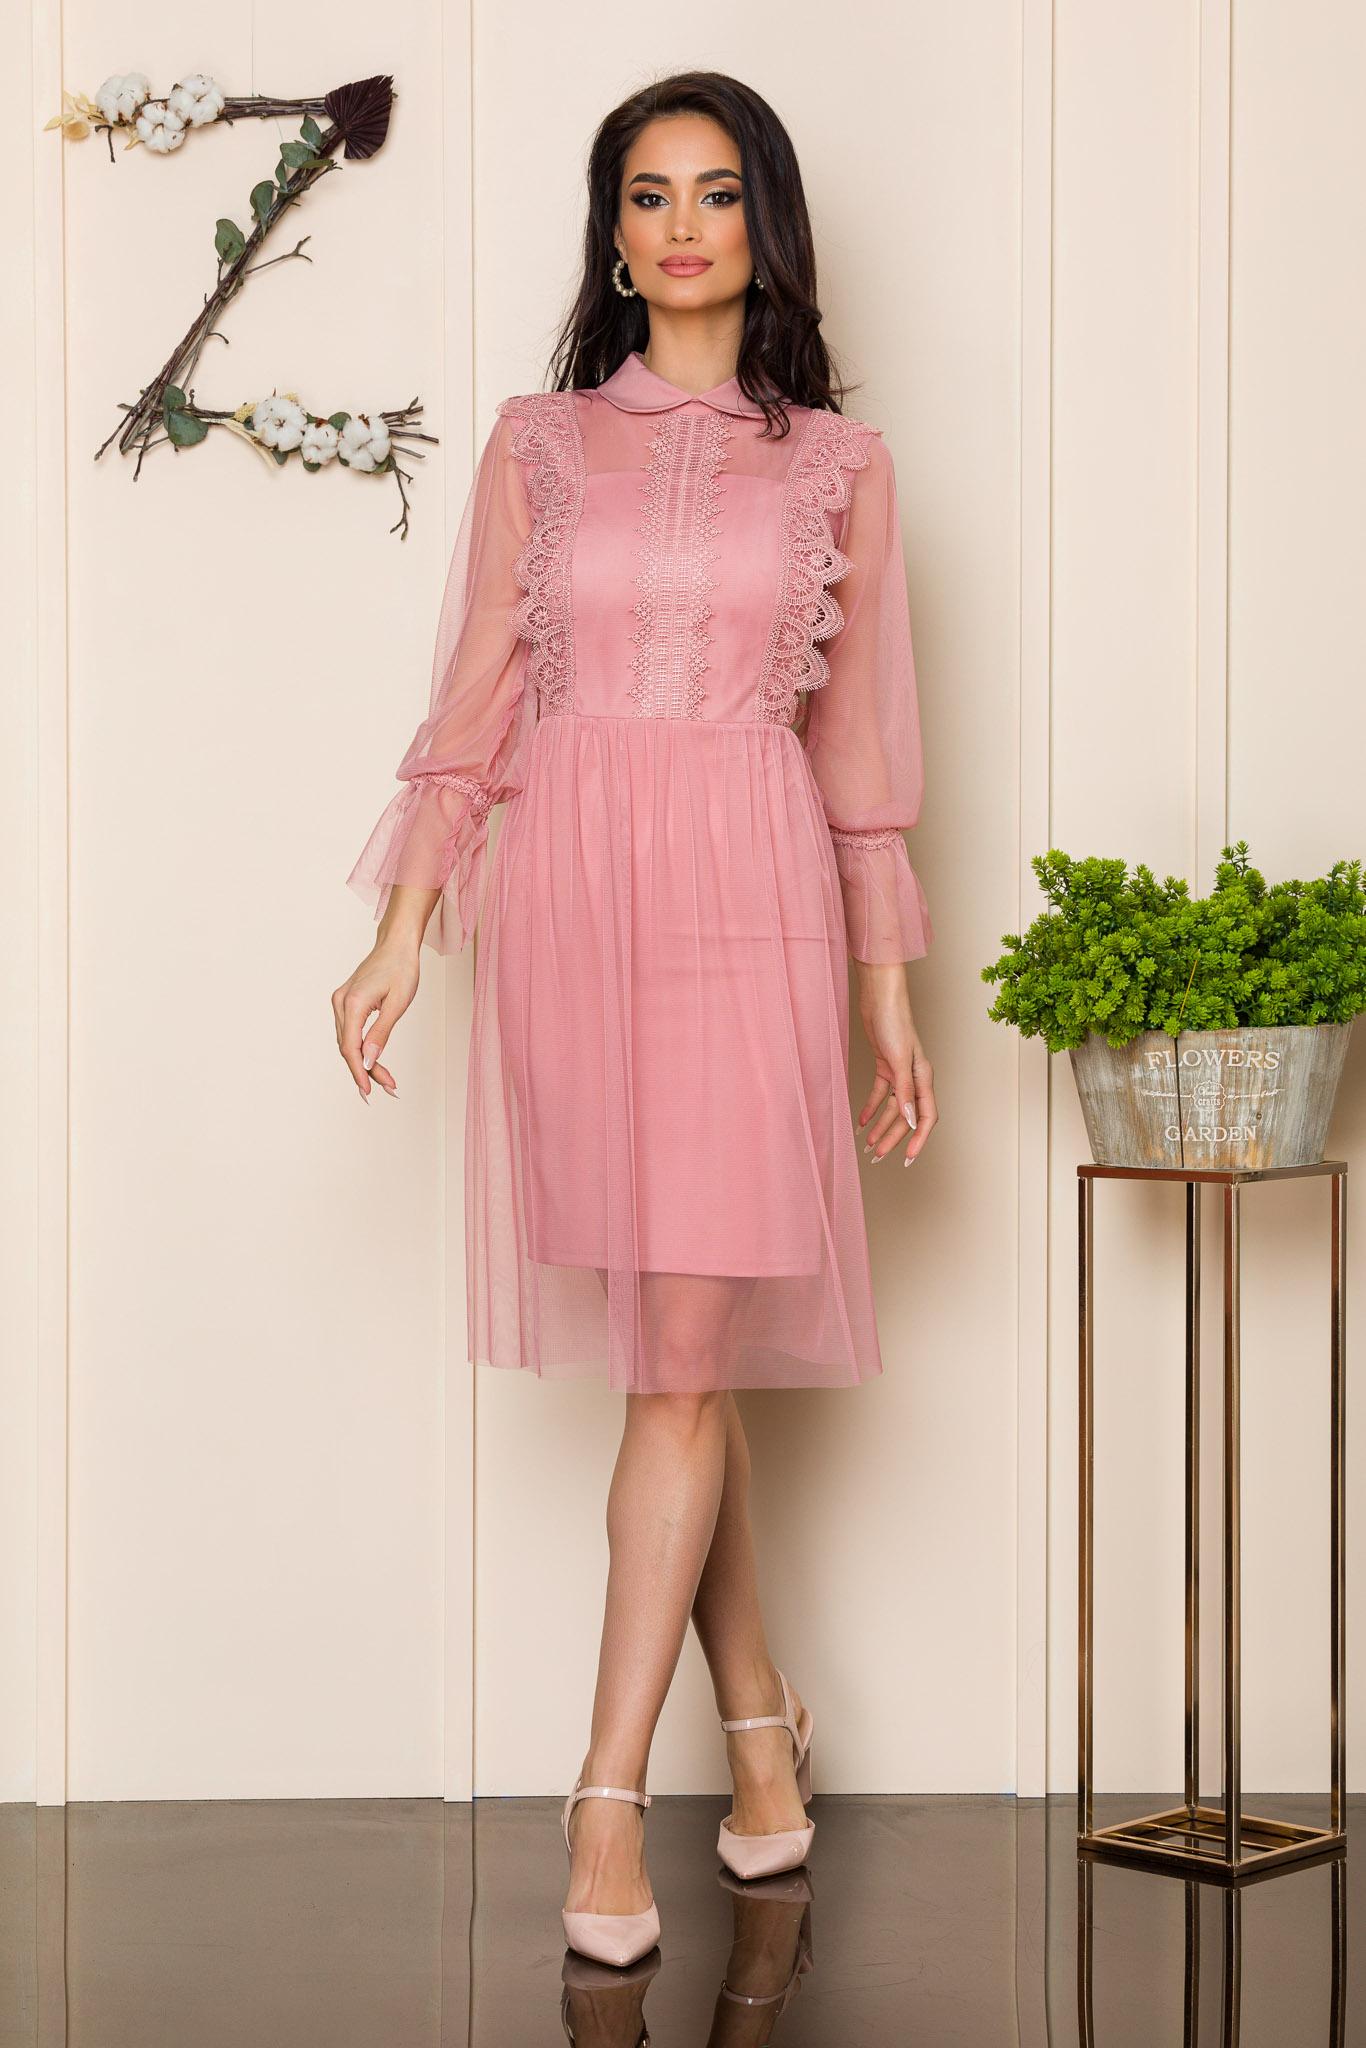 rochie de ocazie rose cu tull 2